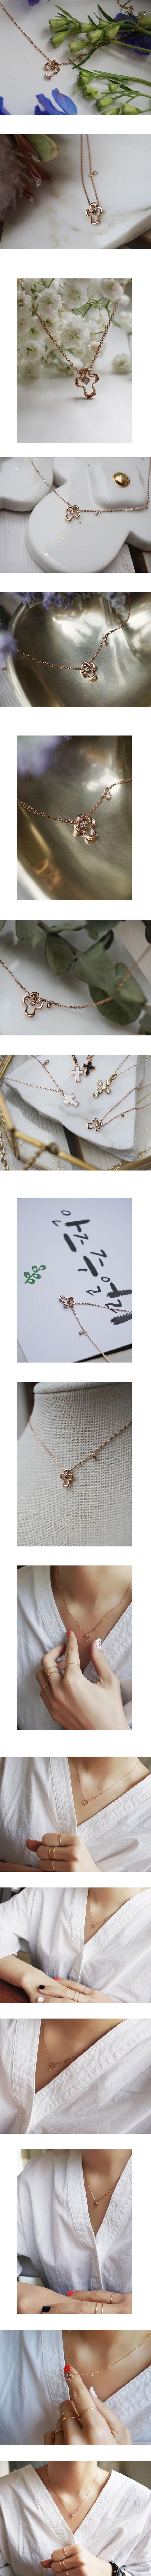 14k 핑크골드 흔들 다이아 라인 십자가 목걸이 - 안즈, 198,000원, 골드, 14K/18K